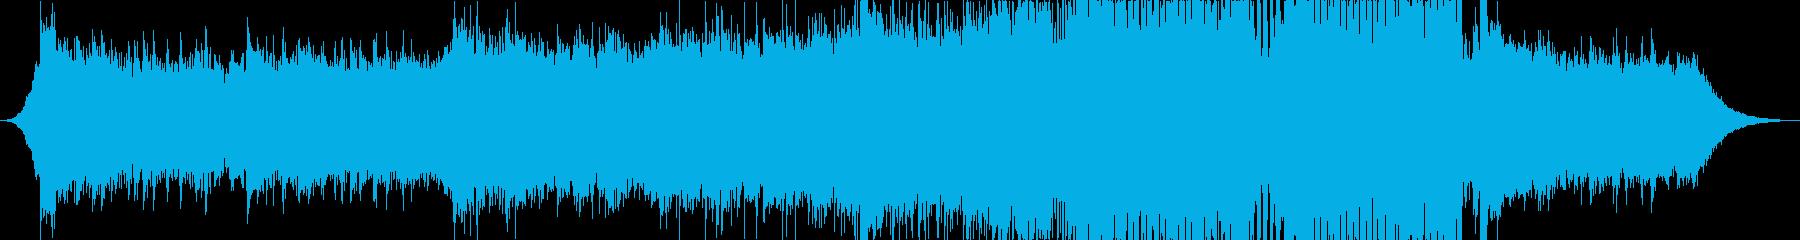 EDM・爽やか・綺麗・高揚感の再生済みの波形